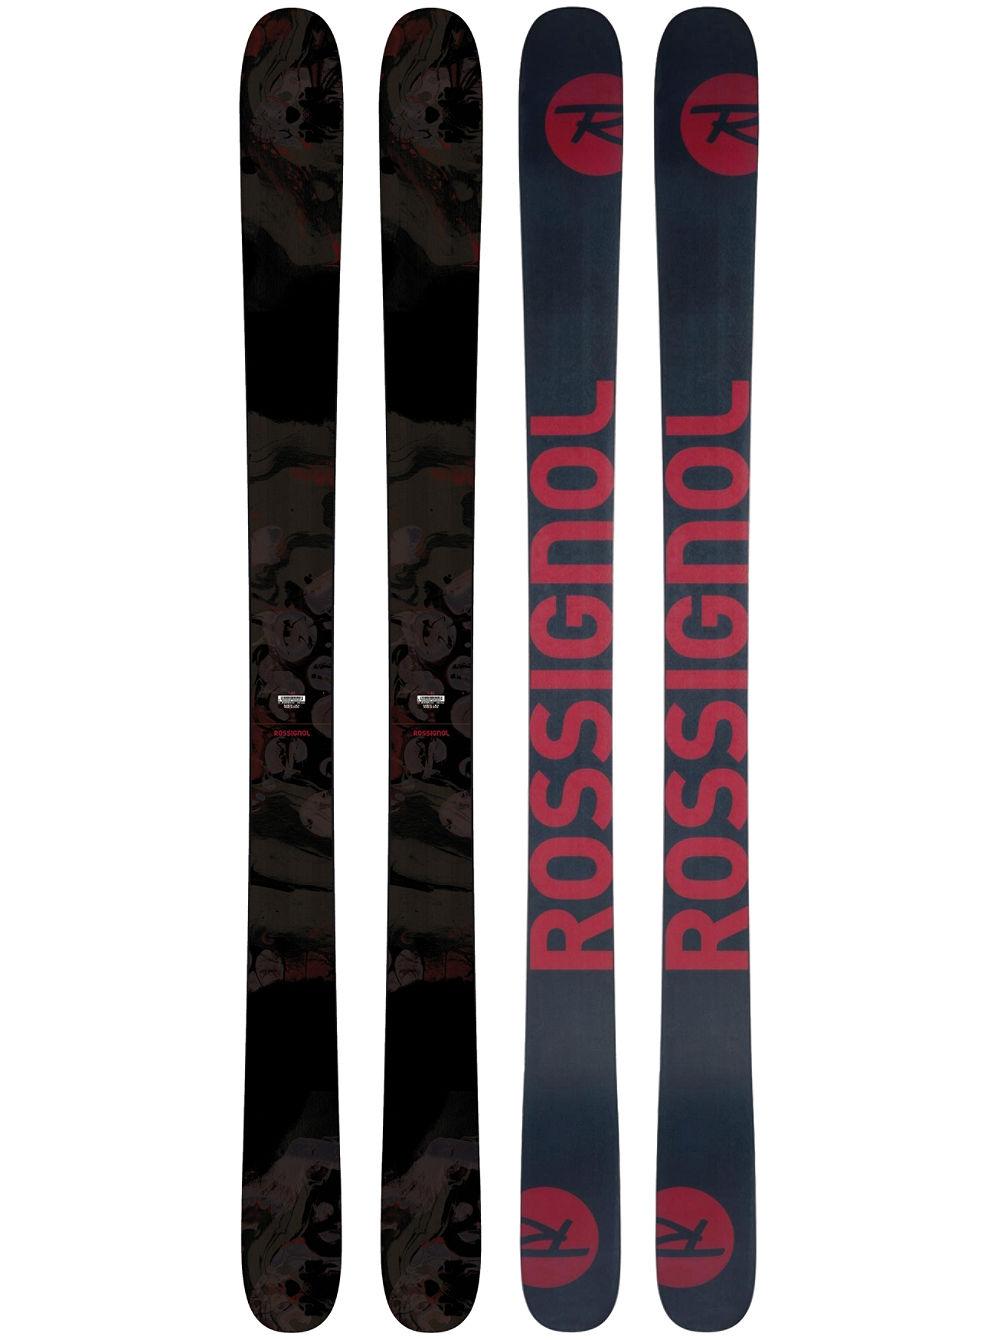 8e56f3e2b3f Rossignol Black Ops 118 176 2019 Ski online kopen bij Blue Tomato